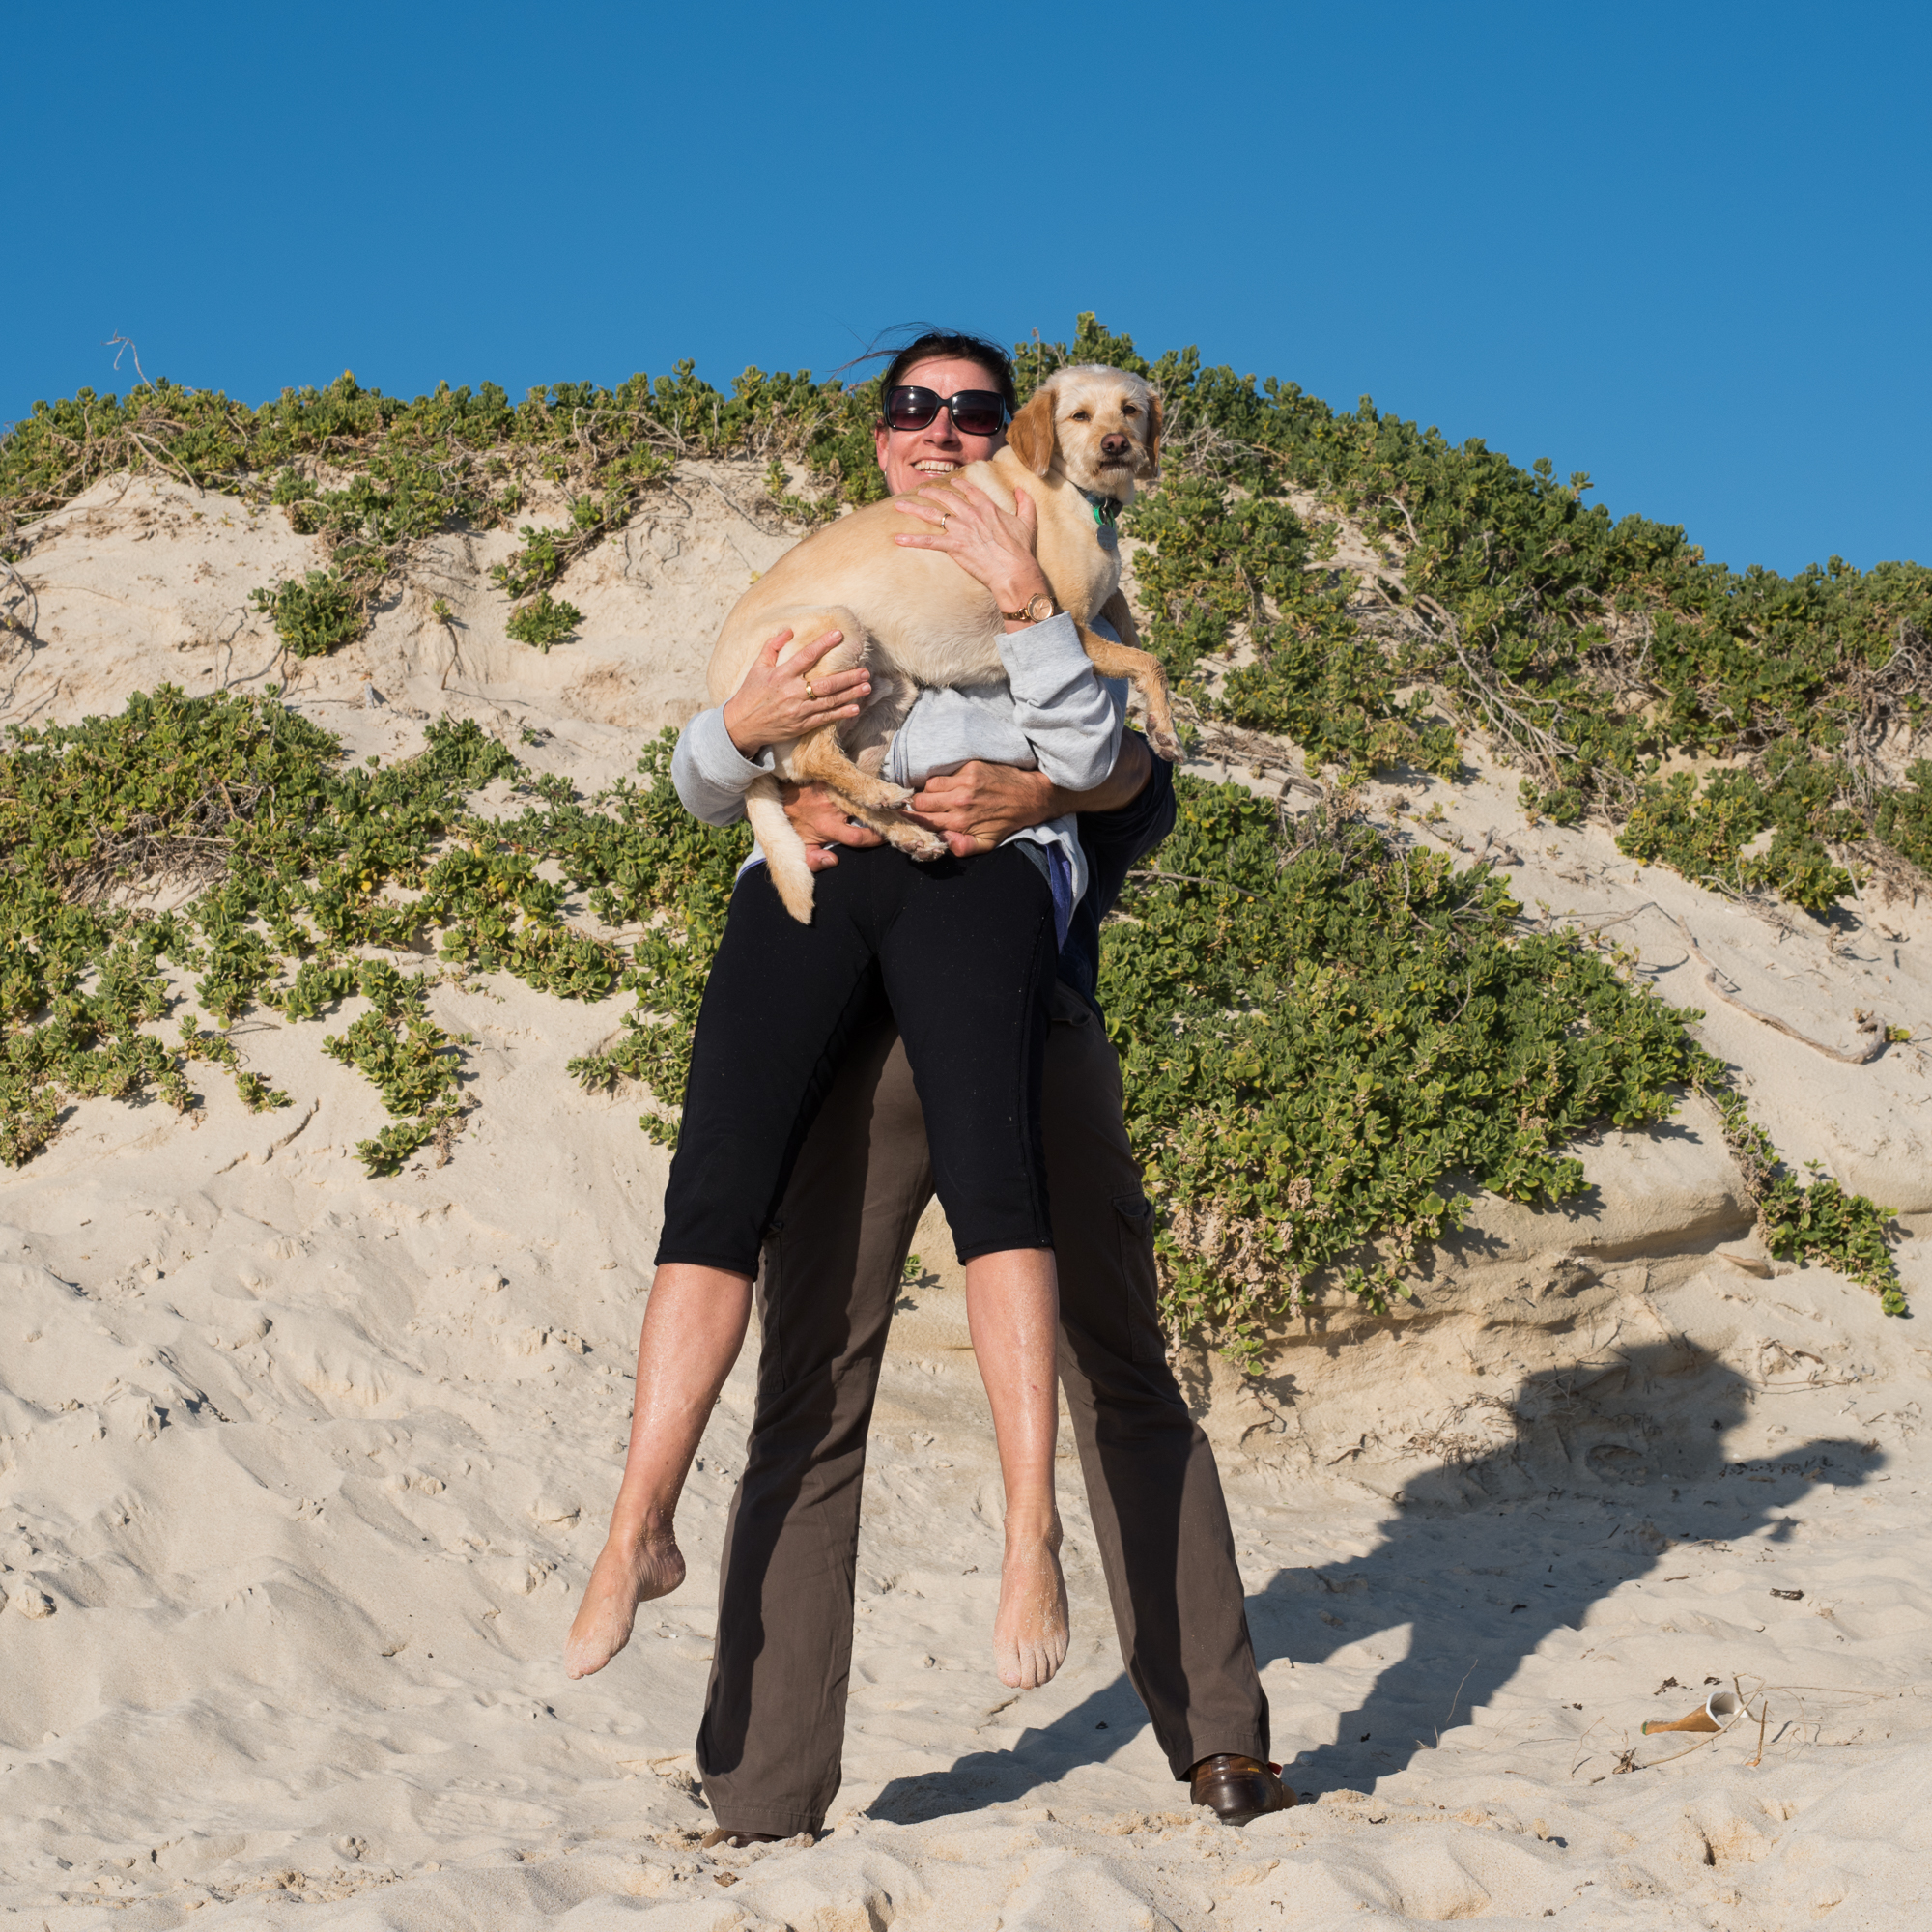 Dog Beach Perth - A dog's life